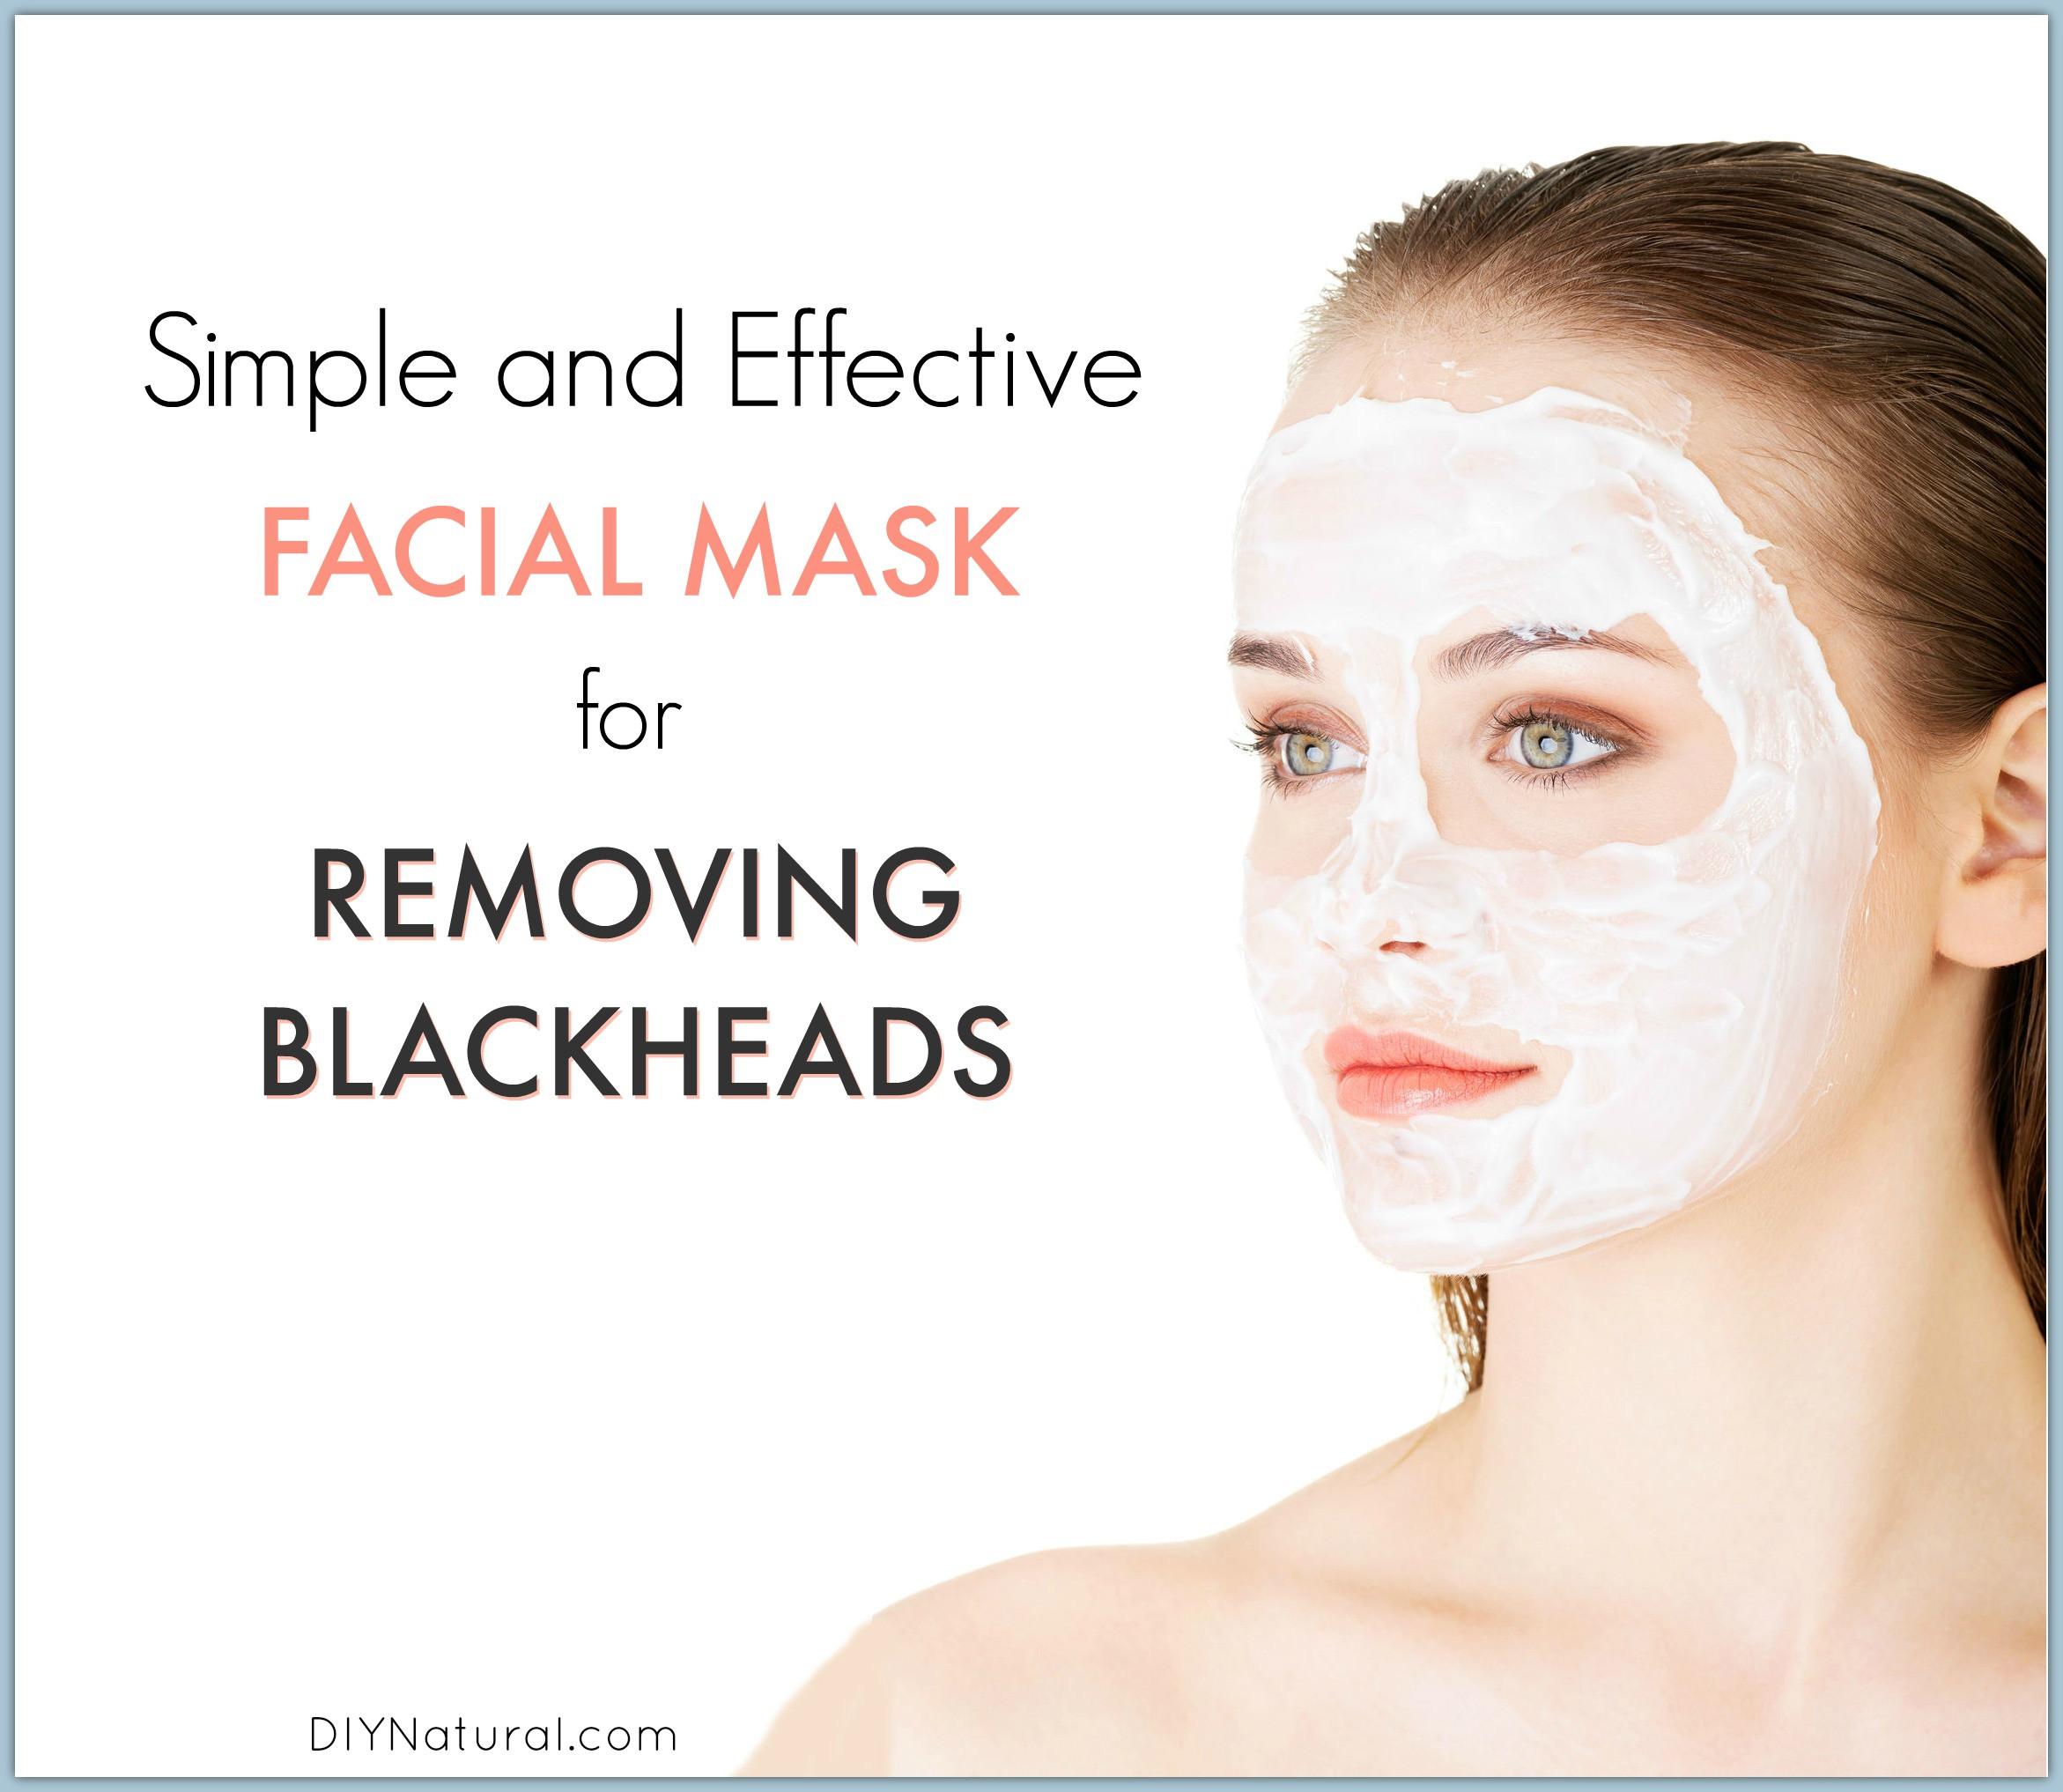 Blackhead Maske Diy  Blackheads A Quick and Easy Homemade Blackhead Mask